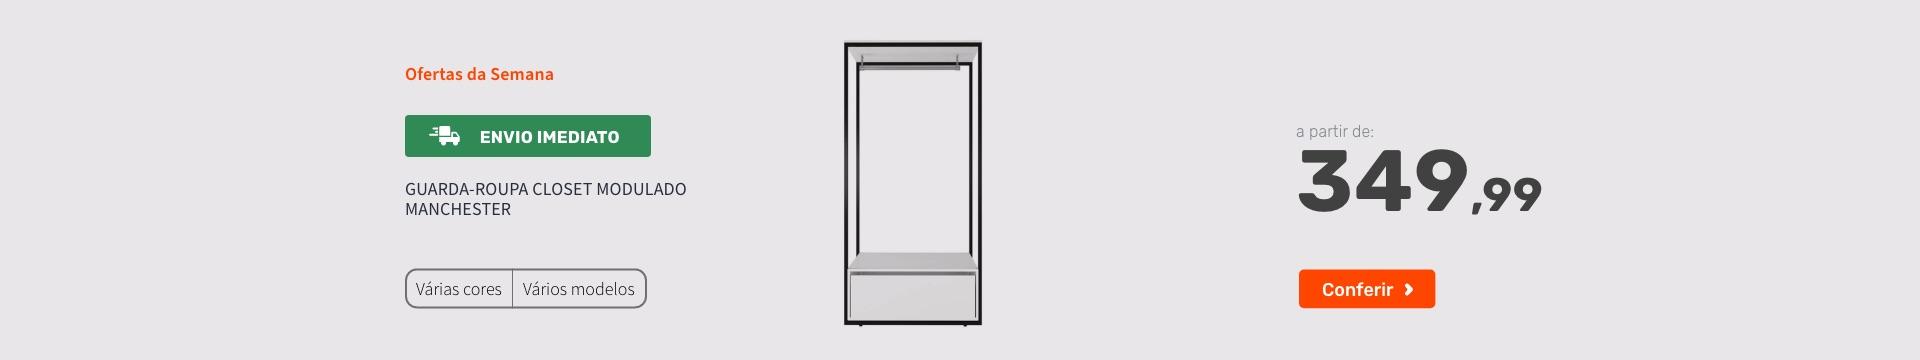 Guarda-Roupa Closet Modulado Manchester - Ofertas especiais